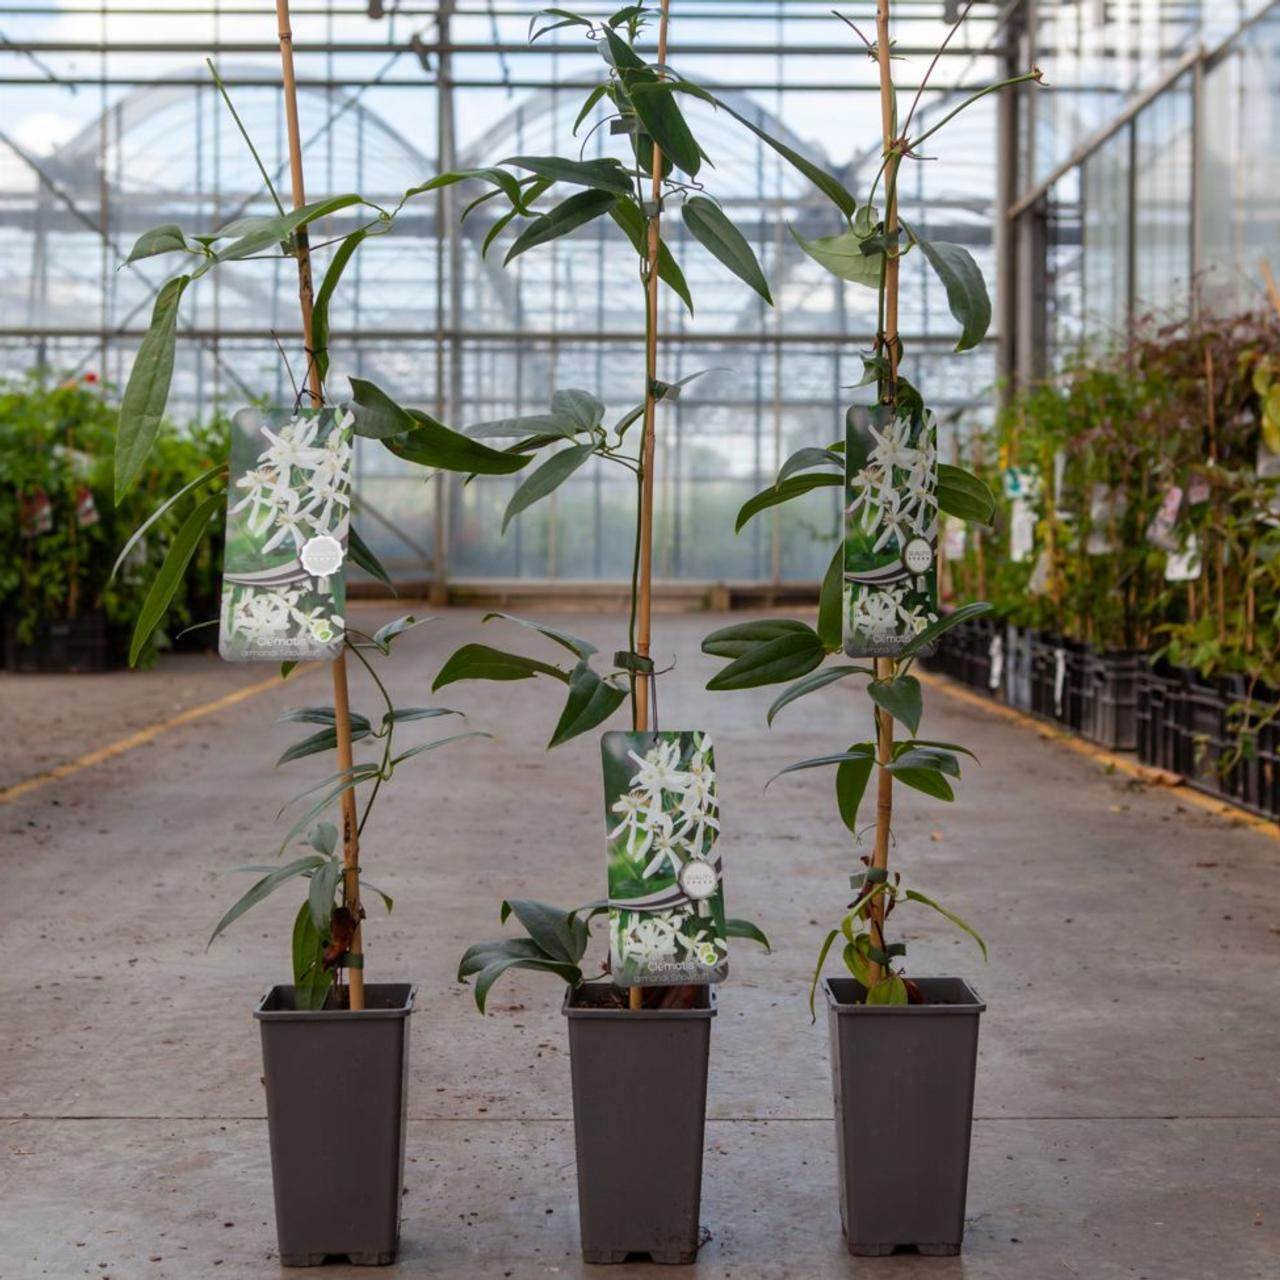 Clematis armandii 'Snowdrift' plant